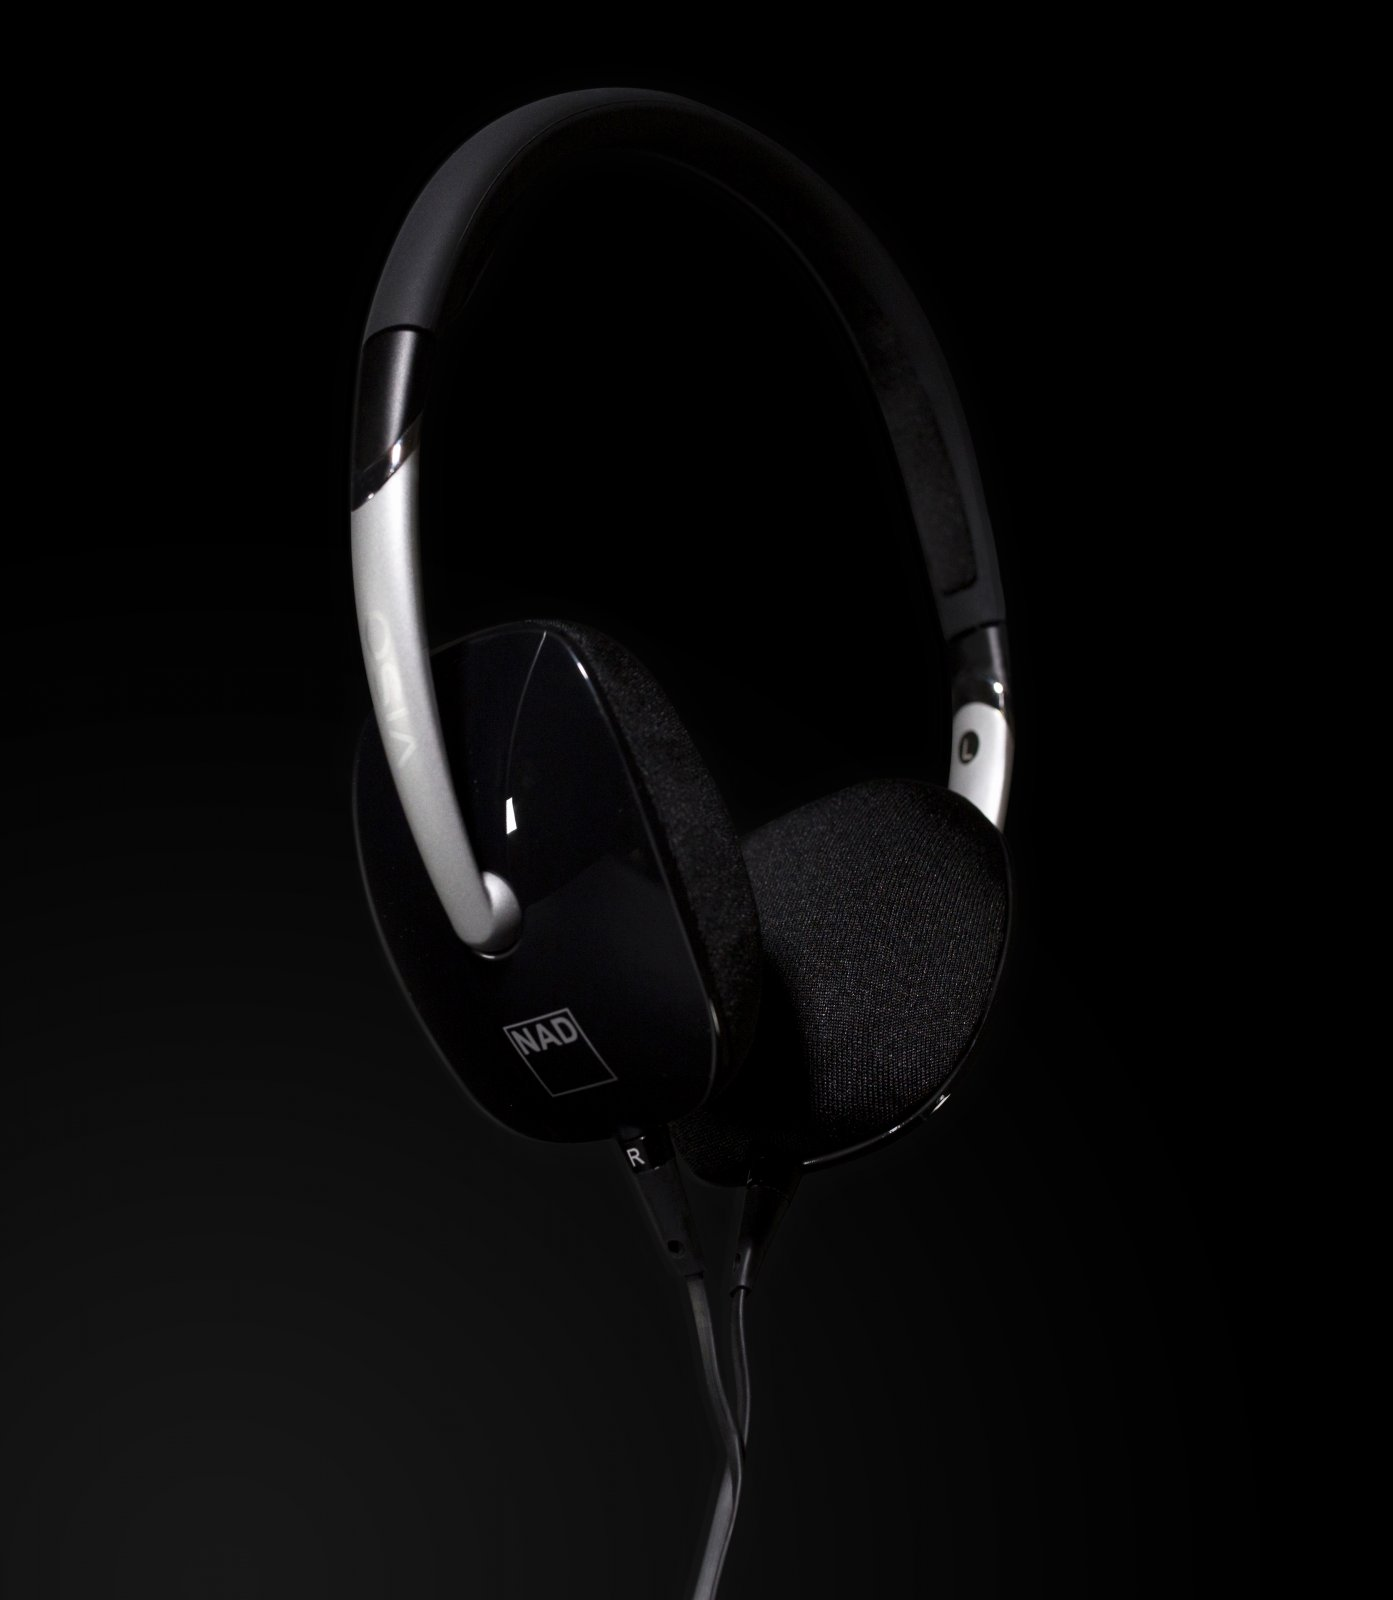 NAD HP30 On-Ear Headphones